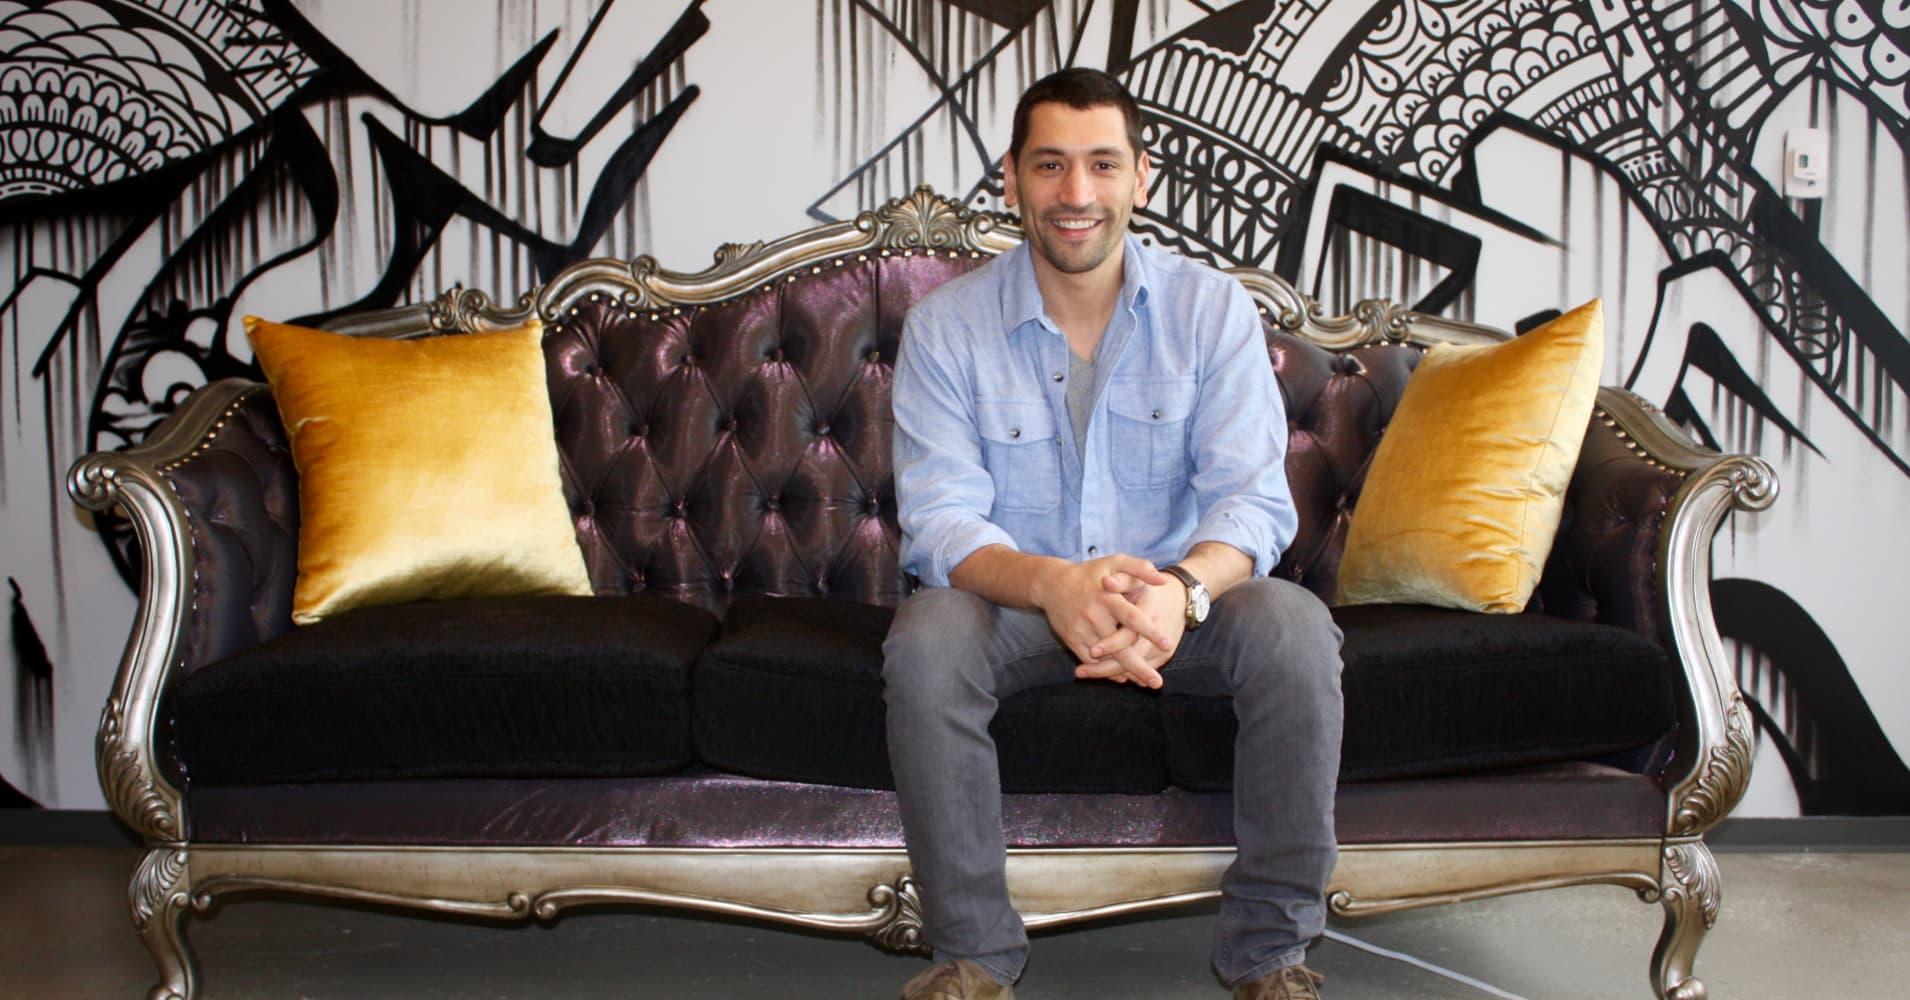 Adam Lyons, CEO of The Zebra